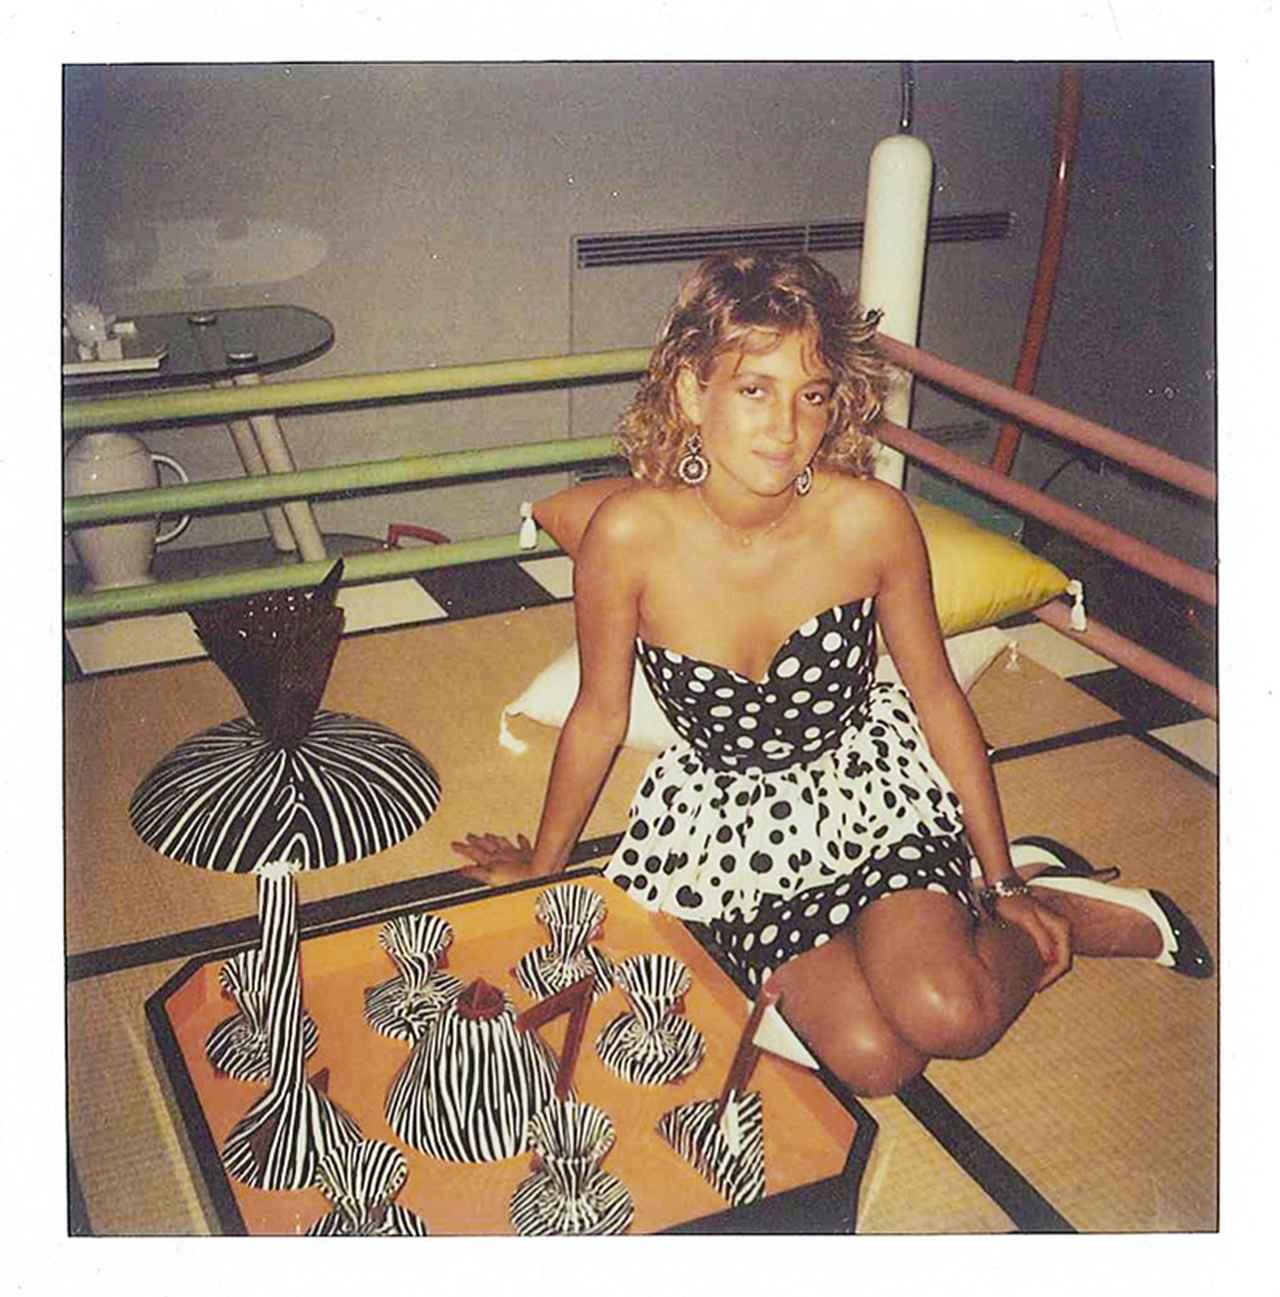 Images : 6番目の画像 - 「シルヴィア・フェンディ、 「私の愛する人たち、 人生を彩るものやこと」」のアルバム - T JAPAN:The New York Times Style Magazine 公式サイト